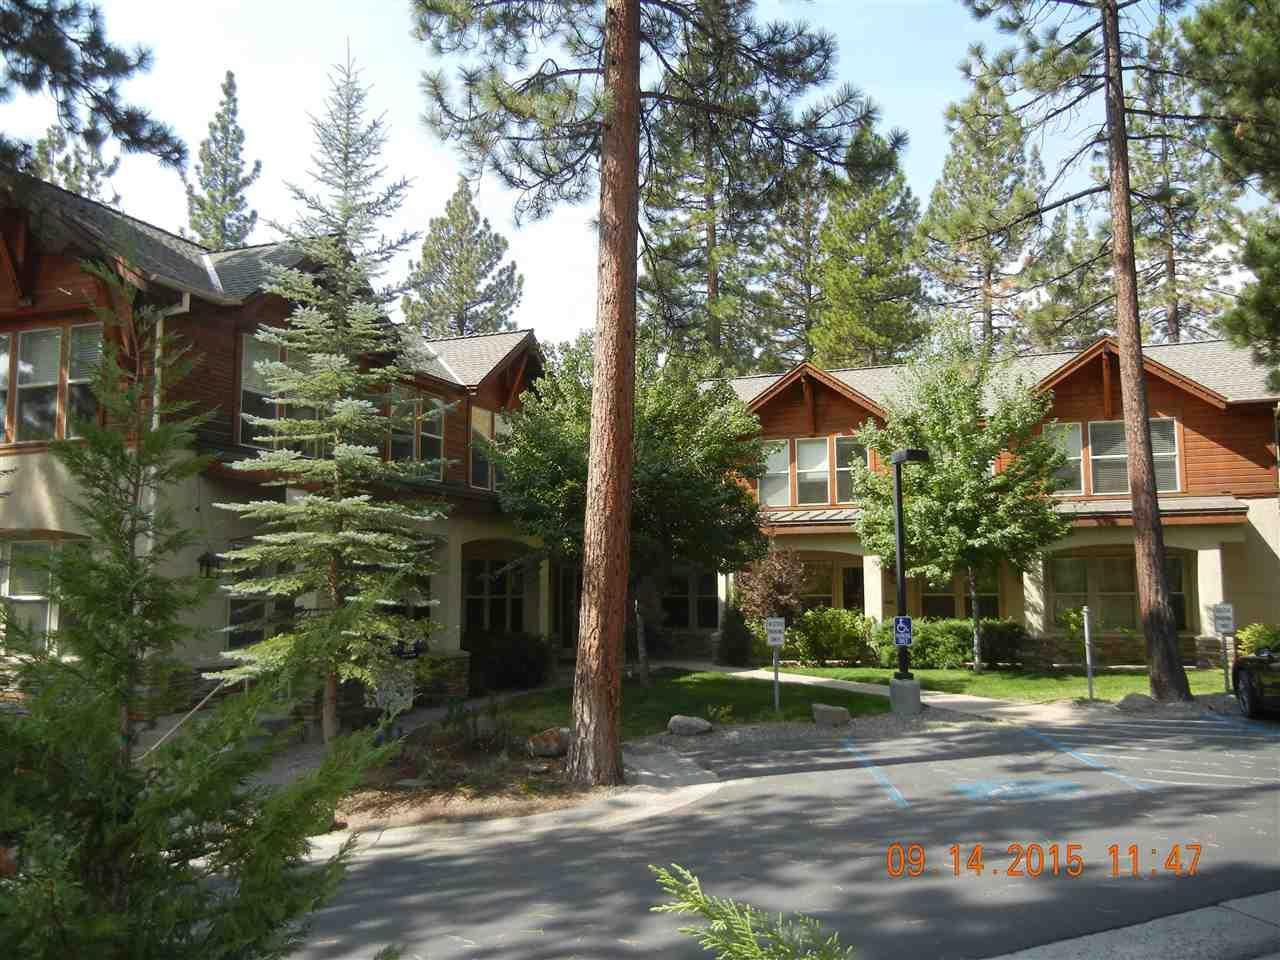 937 Tahoe Blvd - Photo 1